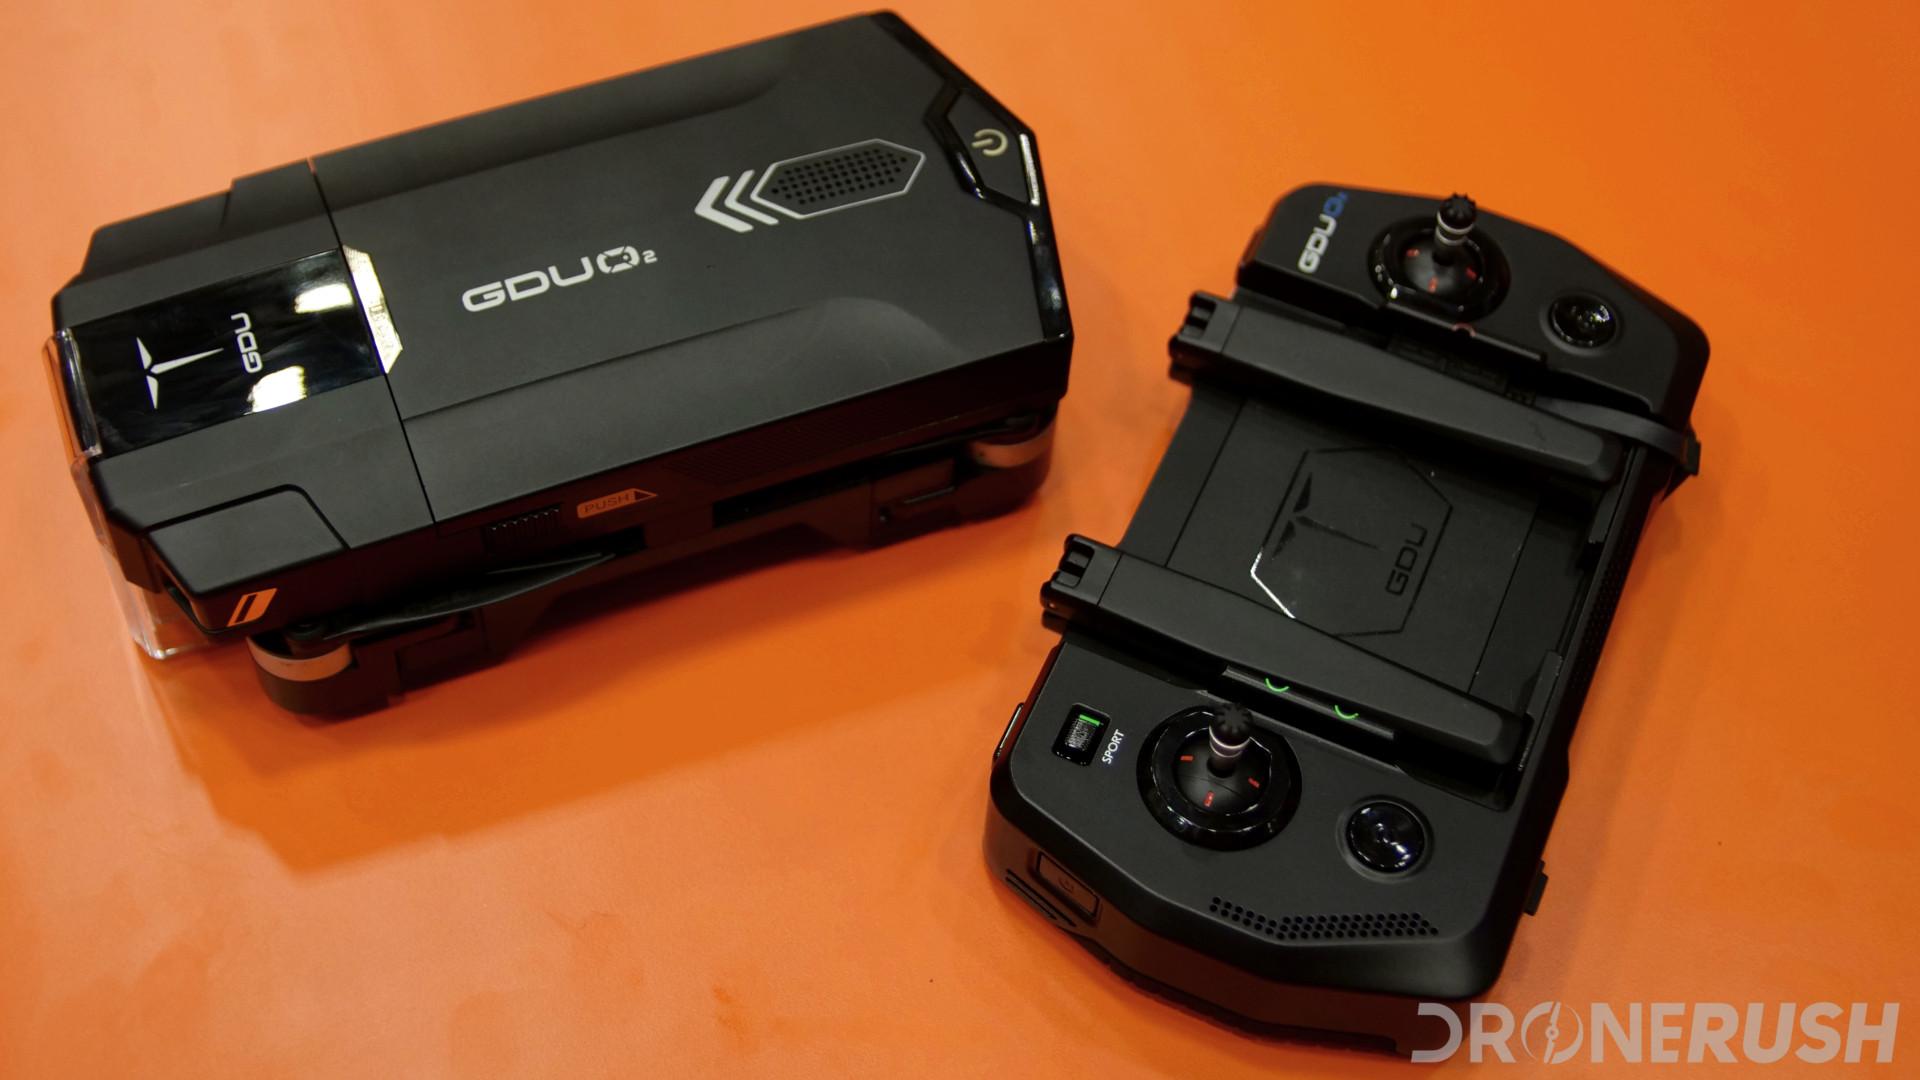 GDU-O2-InterDrone-and-remote